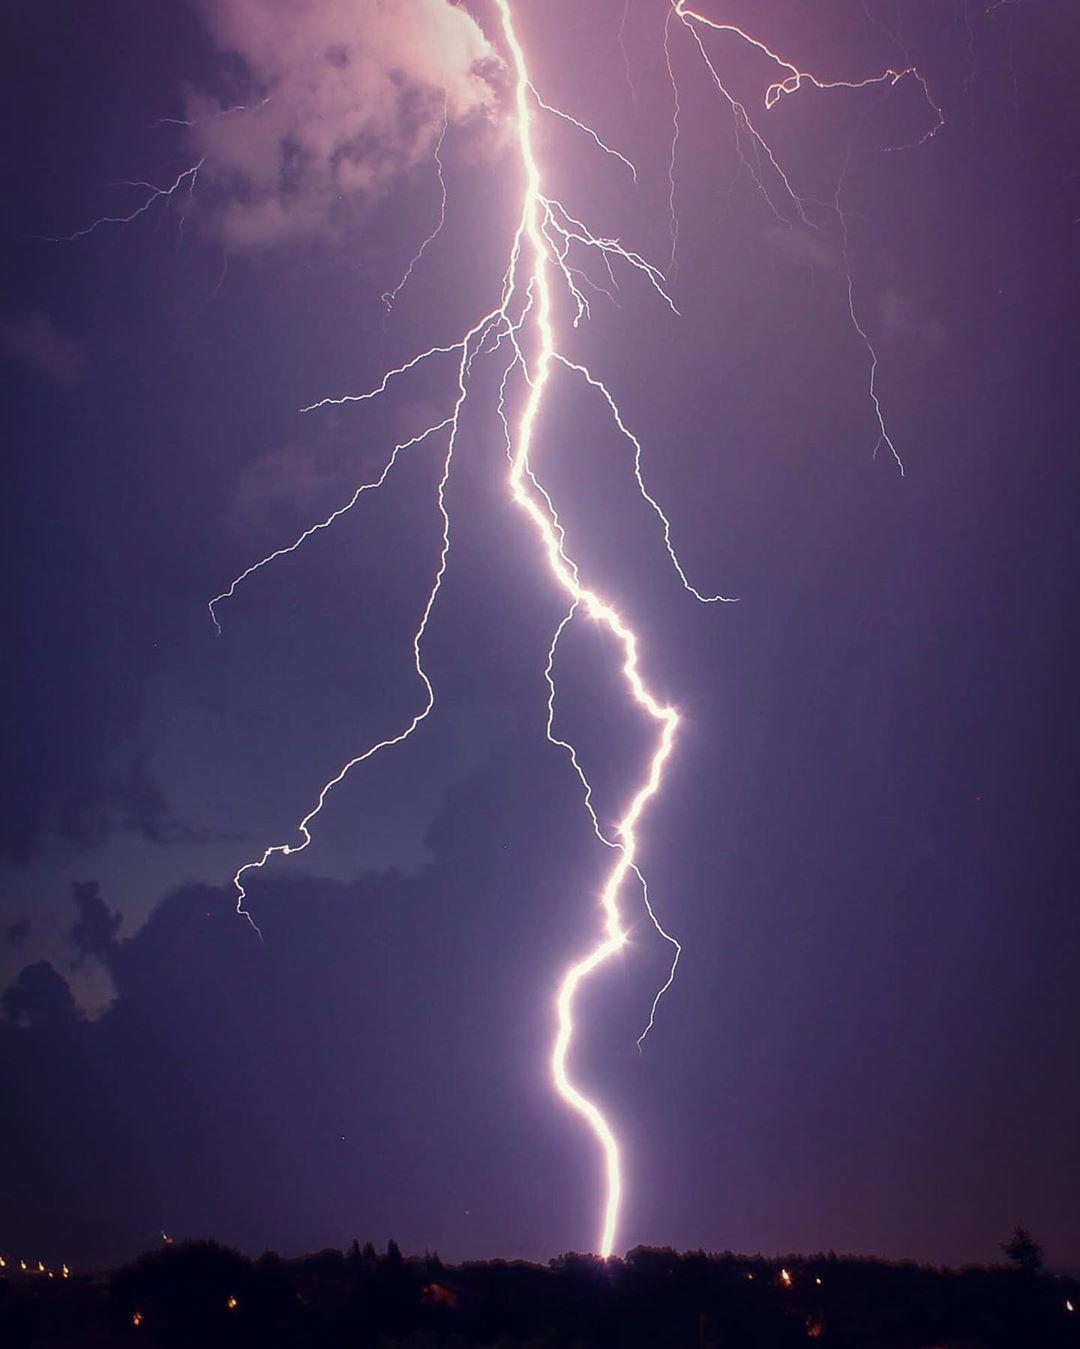 Straight from the sky!! Beautiful!!! #naturephotography #nature #lightning #lightningstrike #worldisbeautiful #world #nature #naturalphenomenon #sky #darksky #skyphotography #lightningphotography